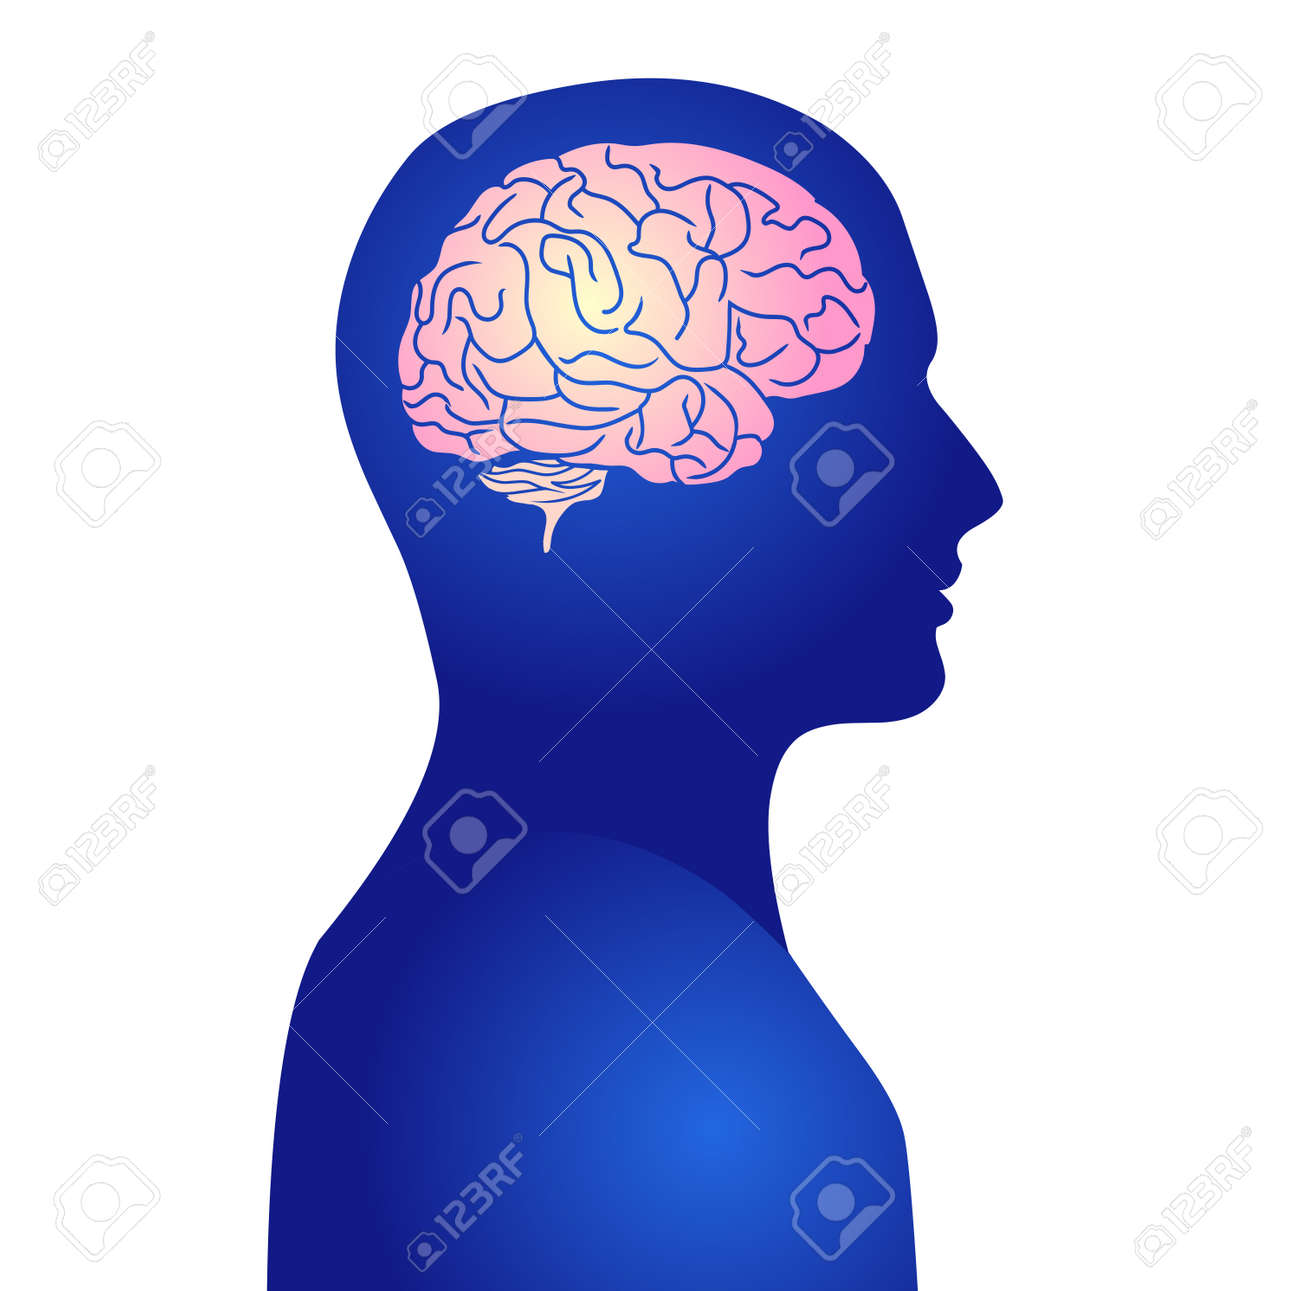 Human active brain vector illustration - 169091564